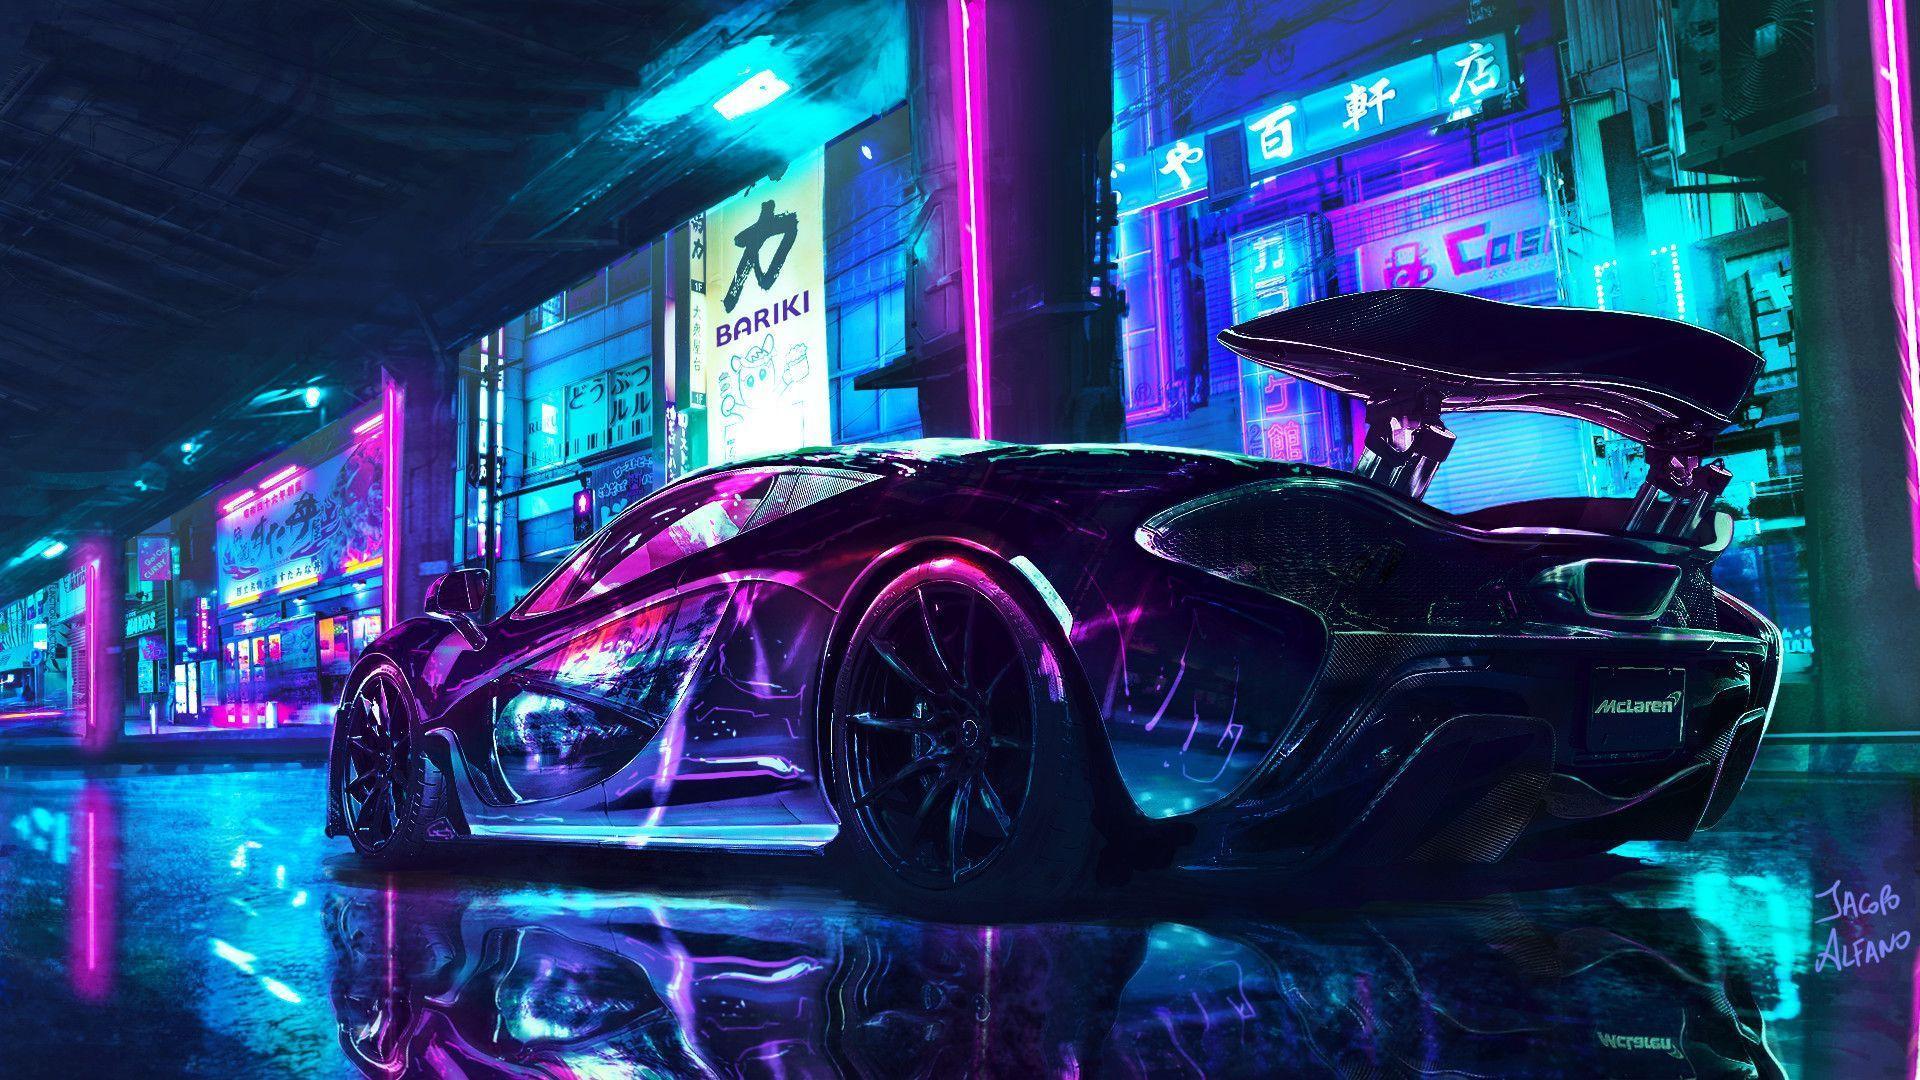 Cyberpunk Car Wallpapers   Top Free Cyberpunk Car Backgrounds ...